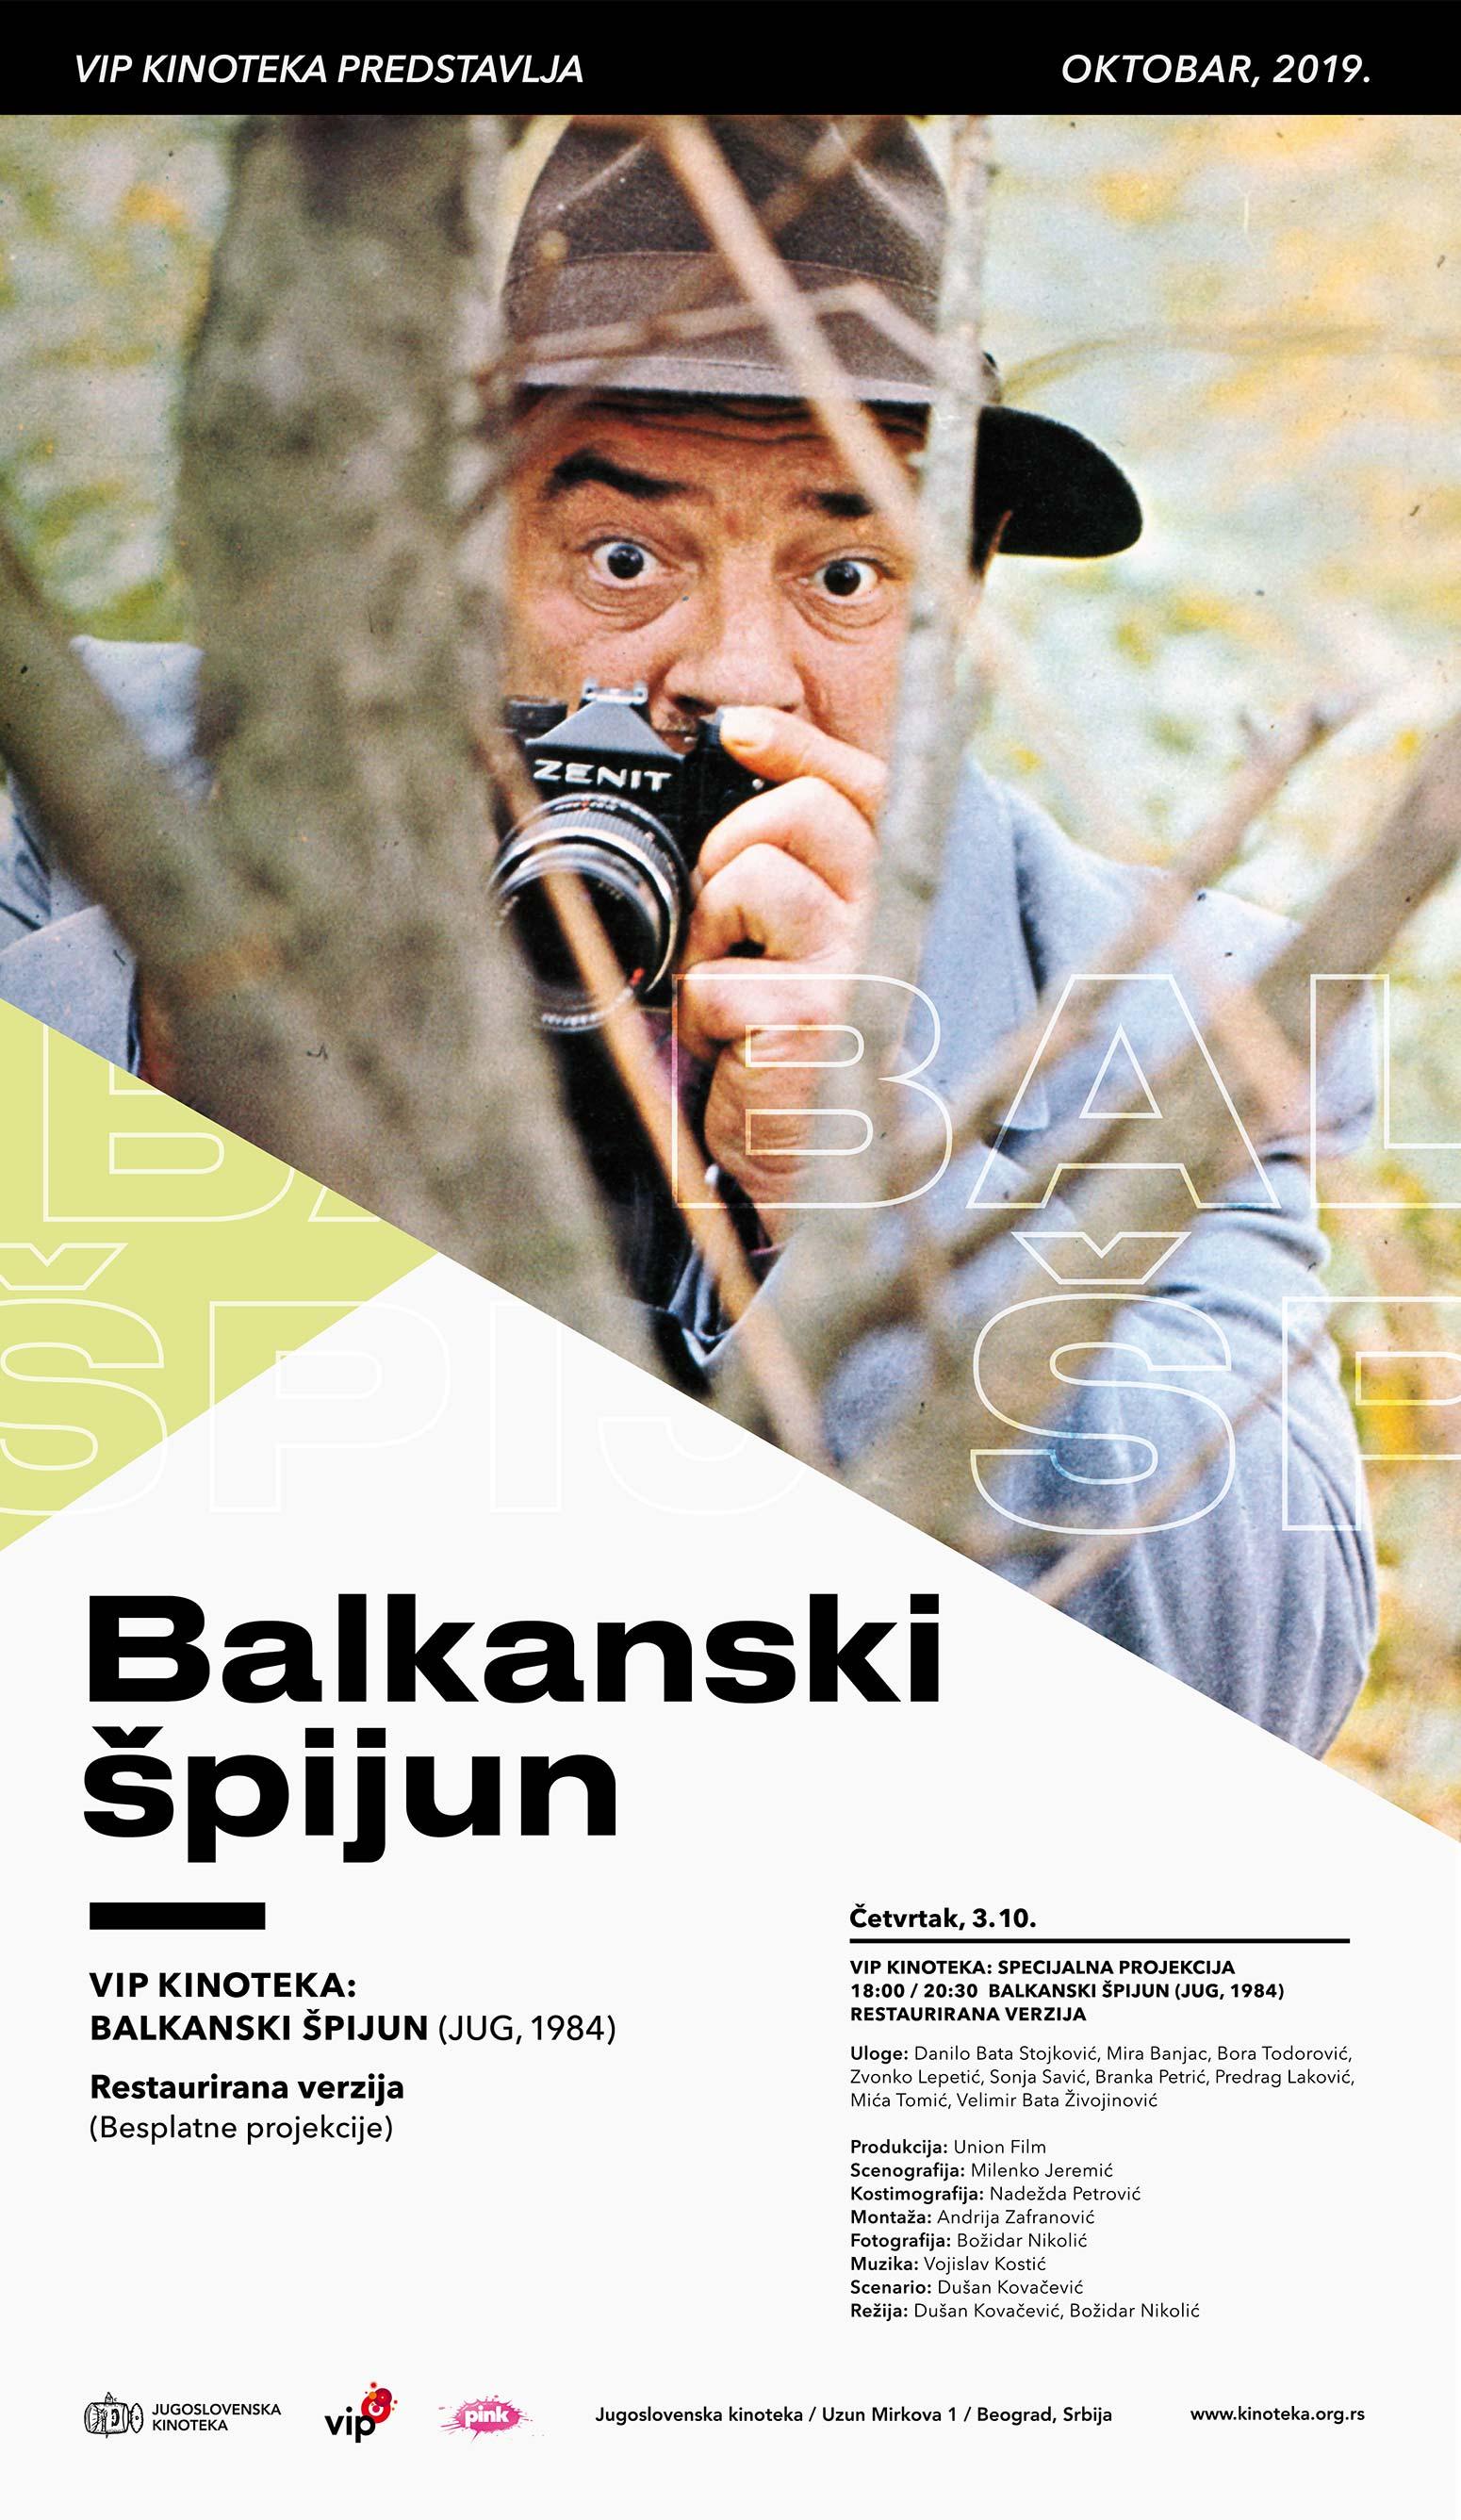 VIP KINOTEKA – Balkanski spijun